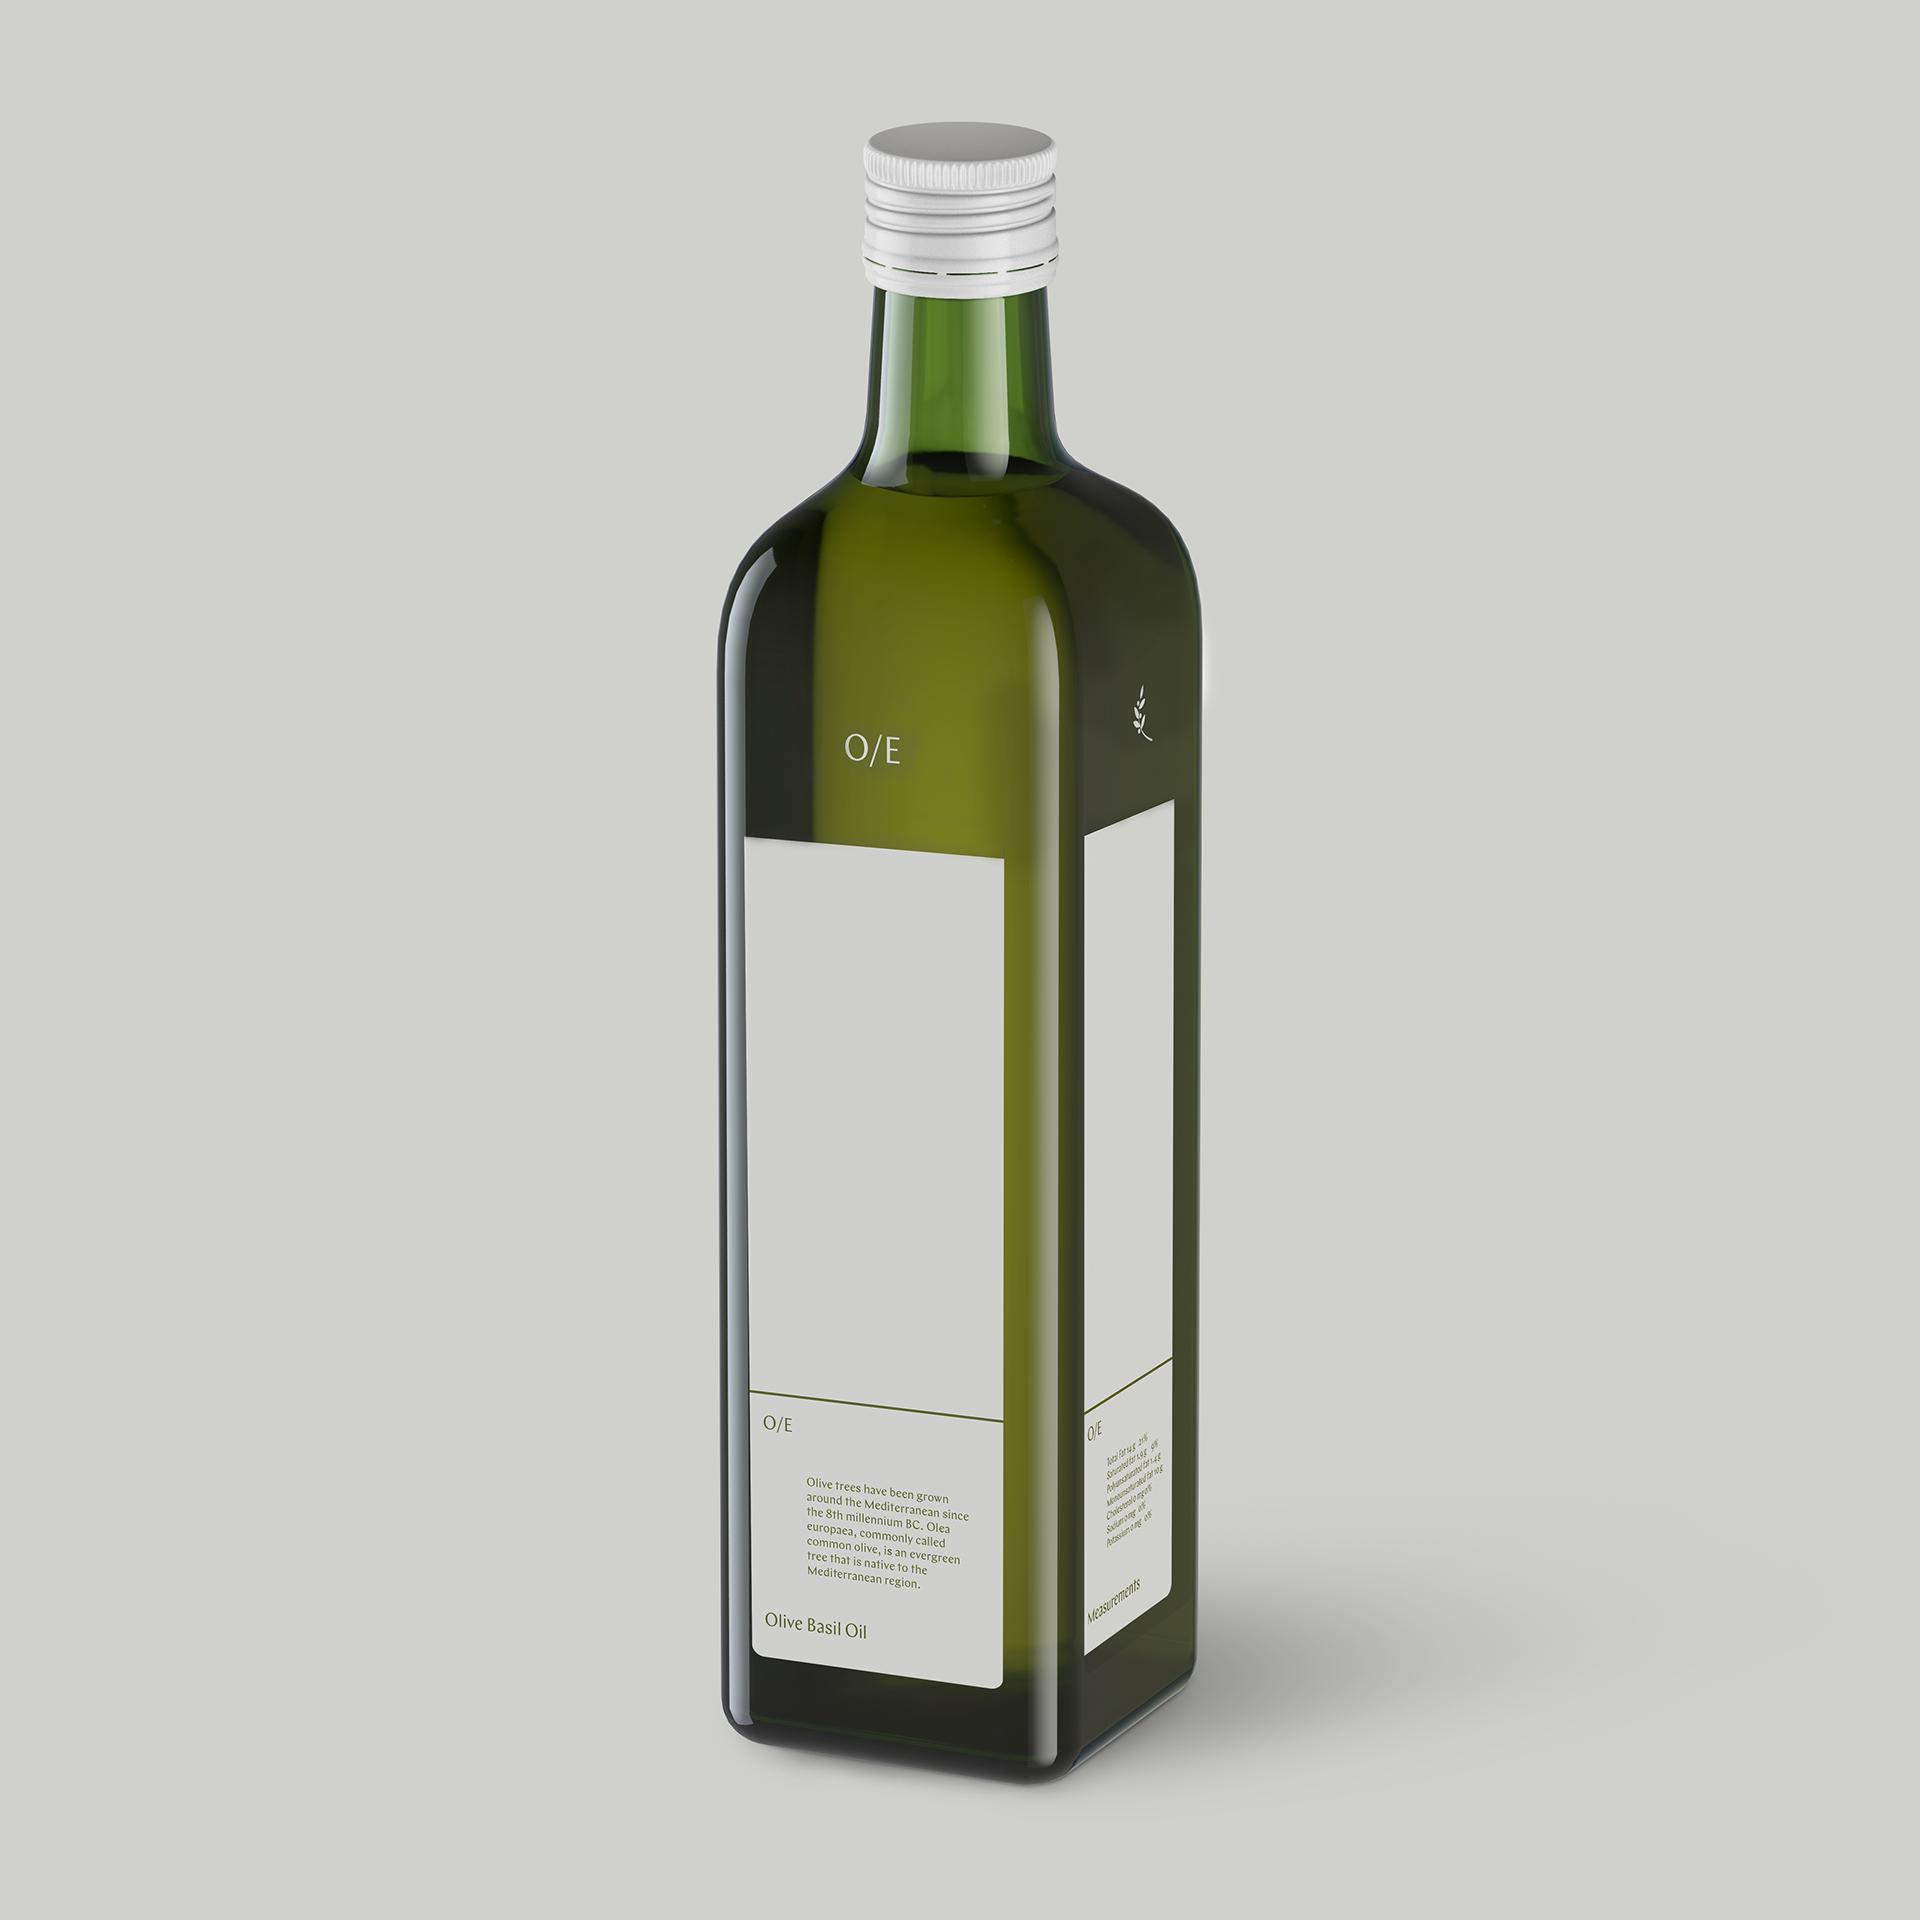 C9786356550993 59b2cd2215057 Png 1920 1920 Olive Oil Oil Bottle Oils